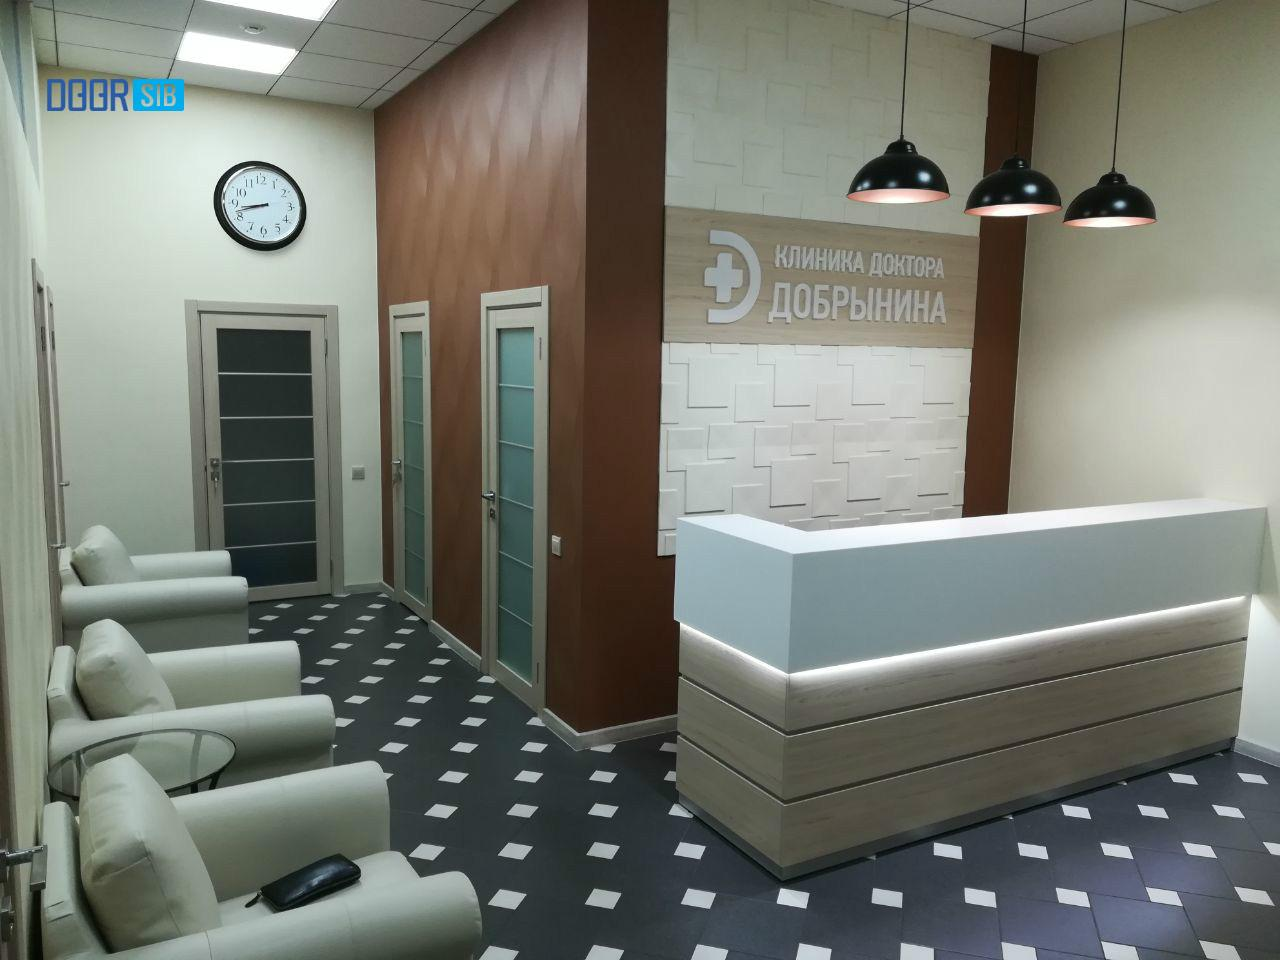 Сибревкома, 9 «Клиника доктора ДОБРЫНИНА»